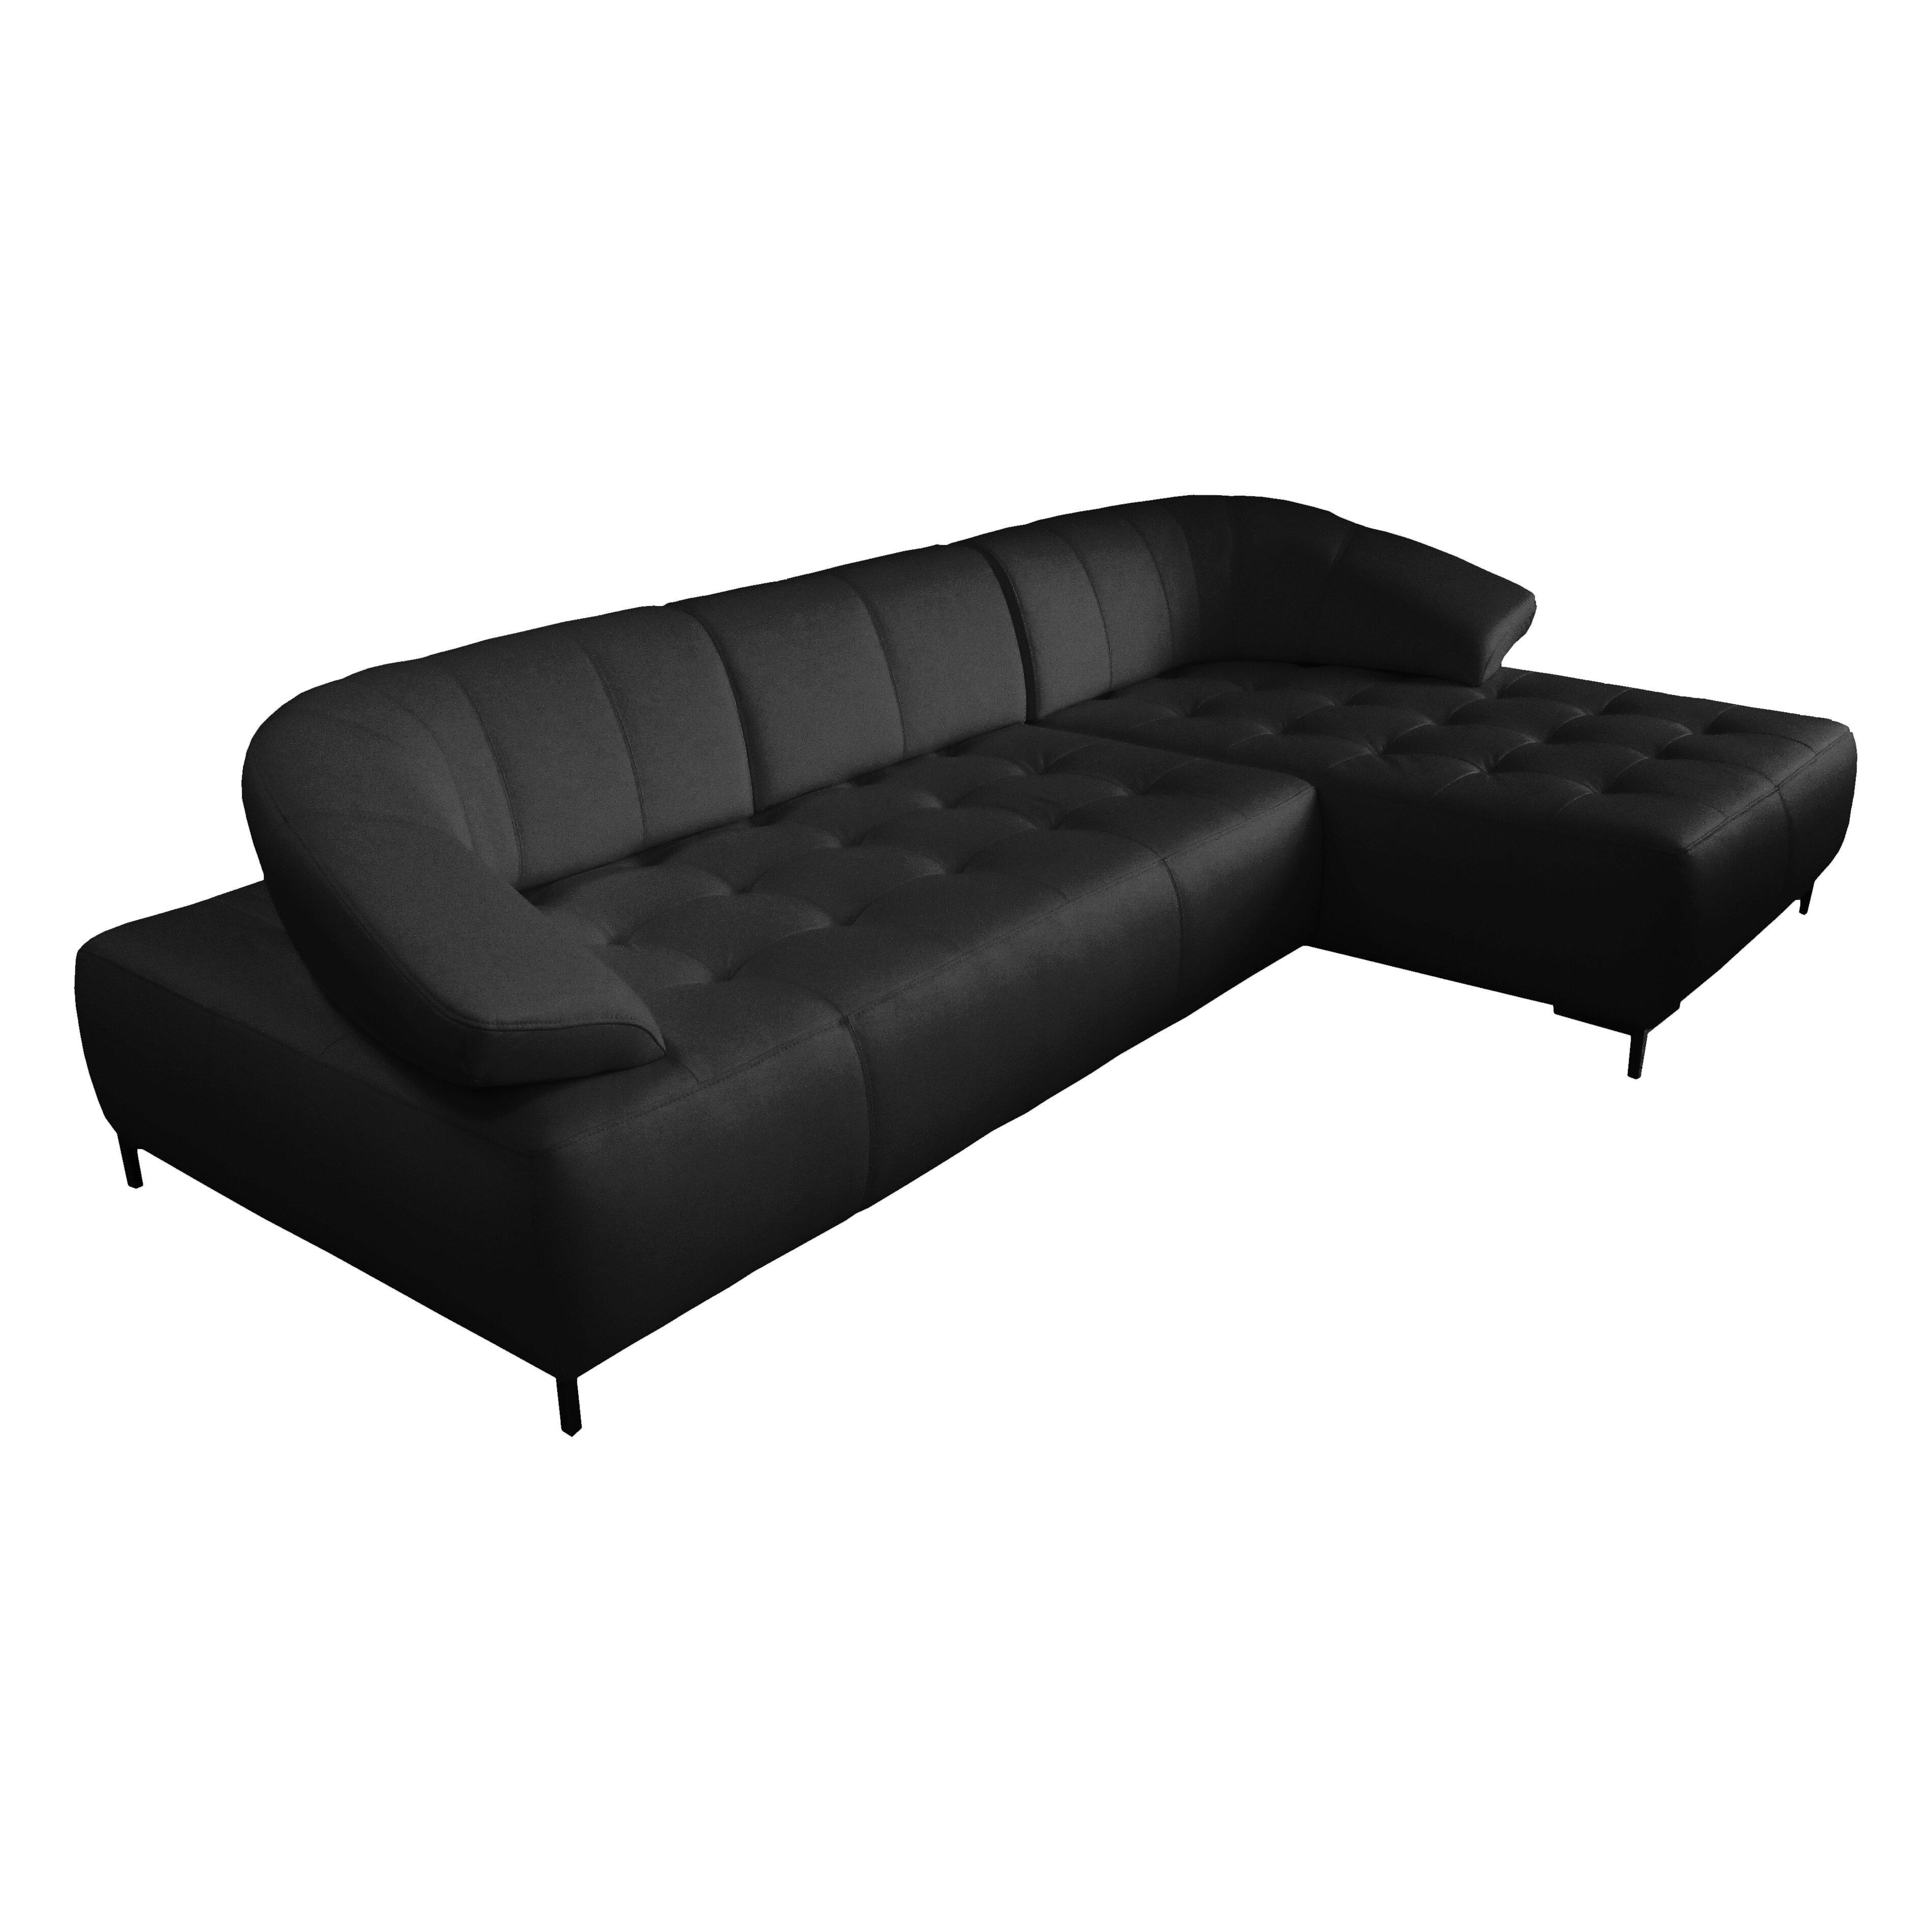 Leather Modular Corner Sofa Cerato Leather Modular Corner Sofa Monaco The Sofa Company The